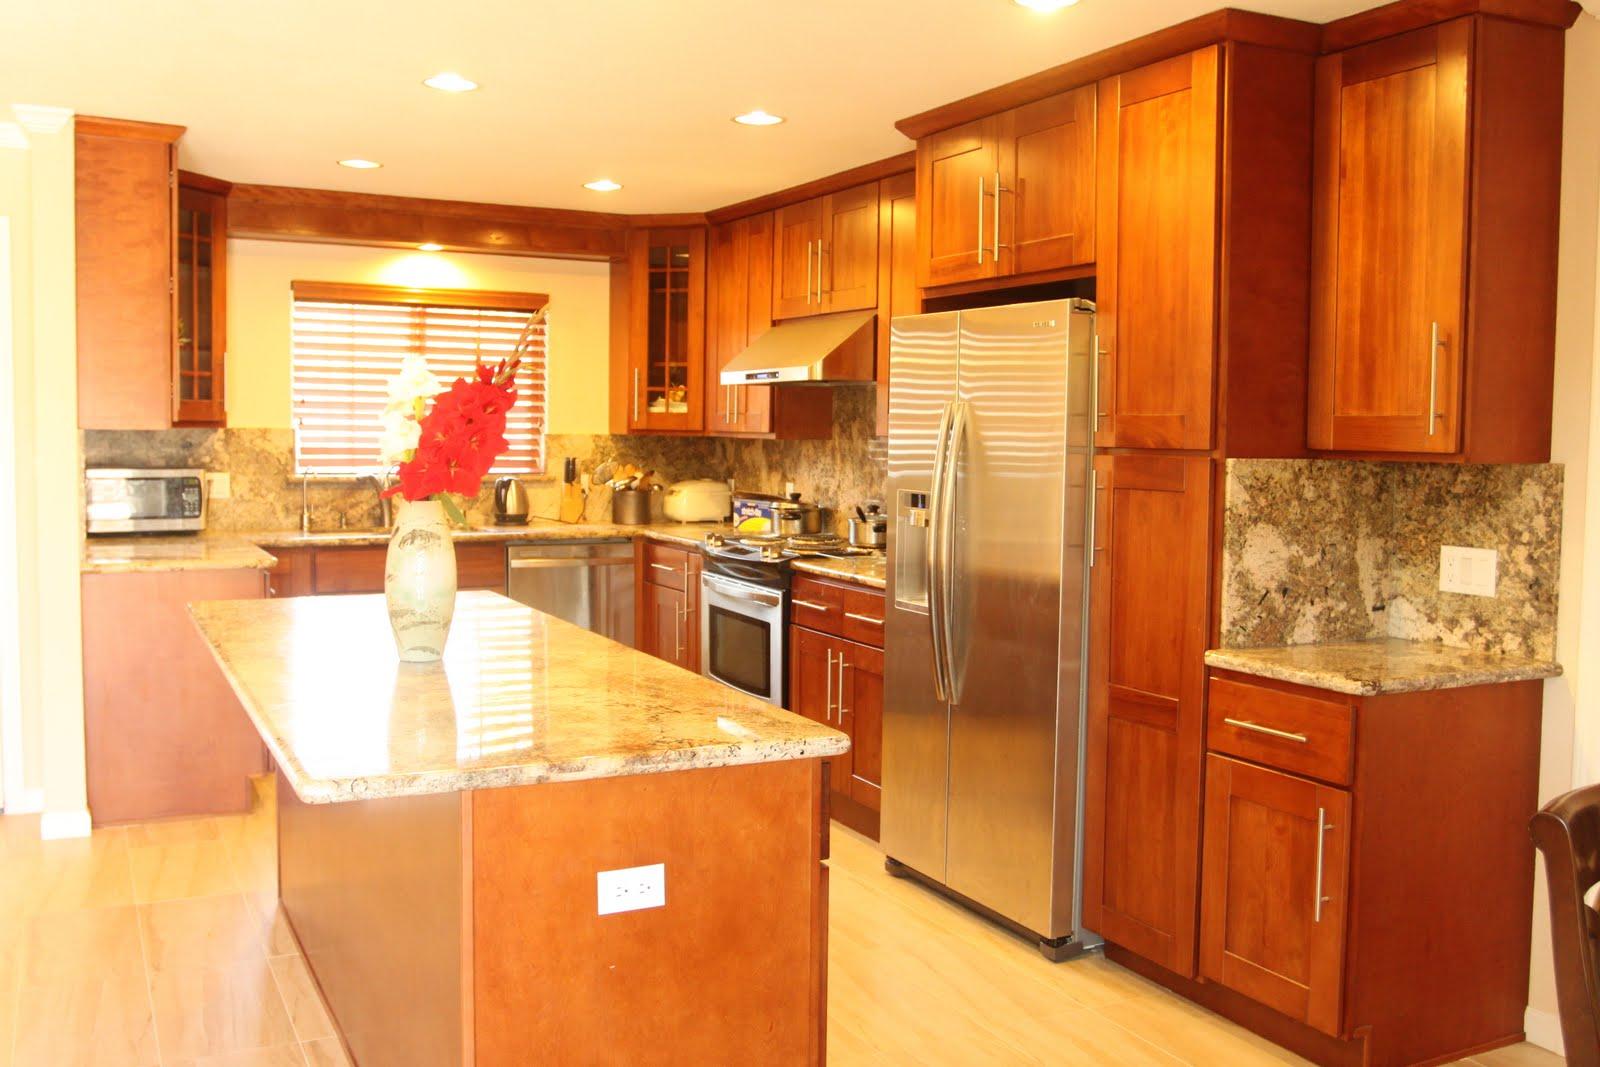 Cherry Shaker Kitchen Cabinets, Juperano Bruzio Granite Counter Top